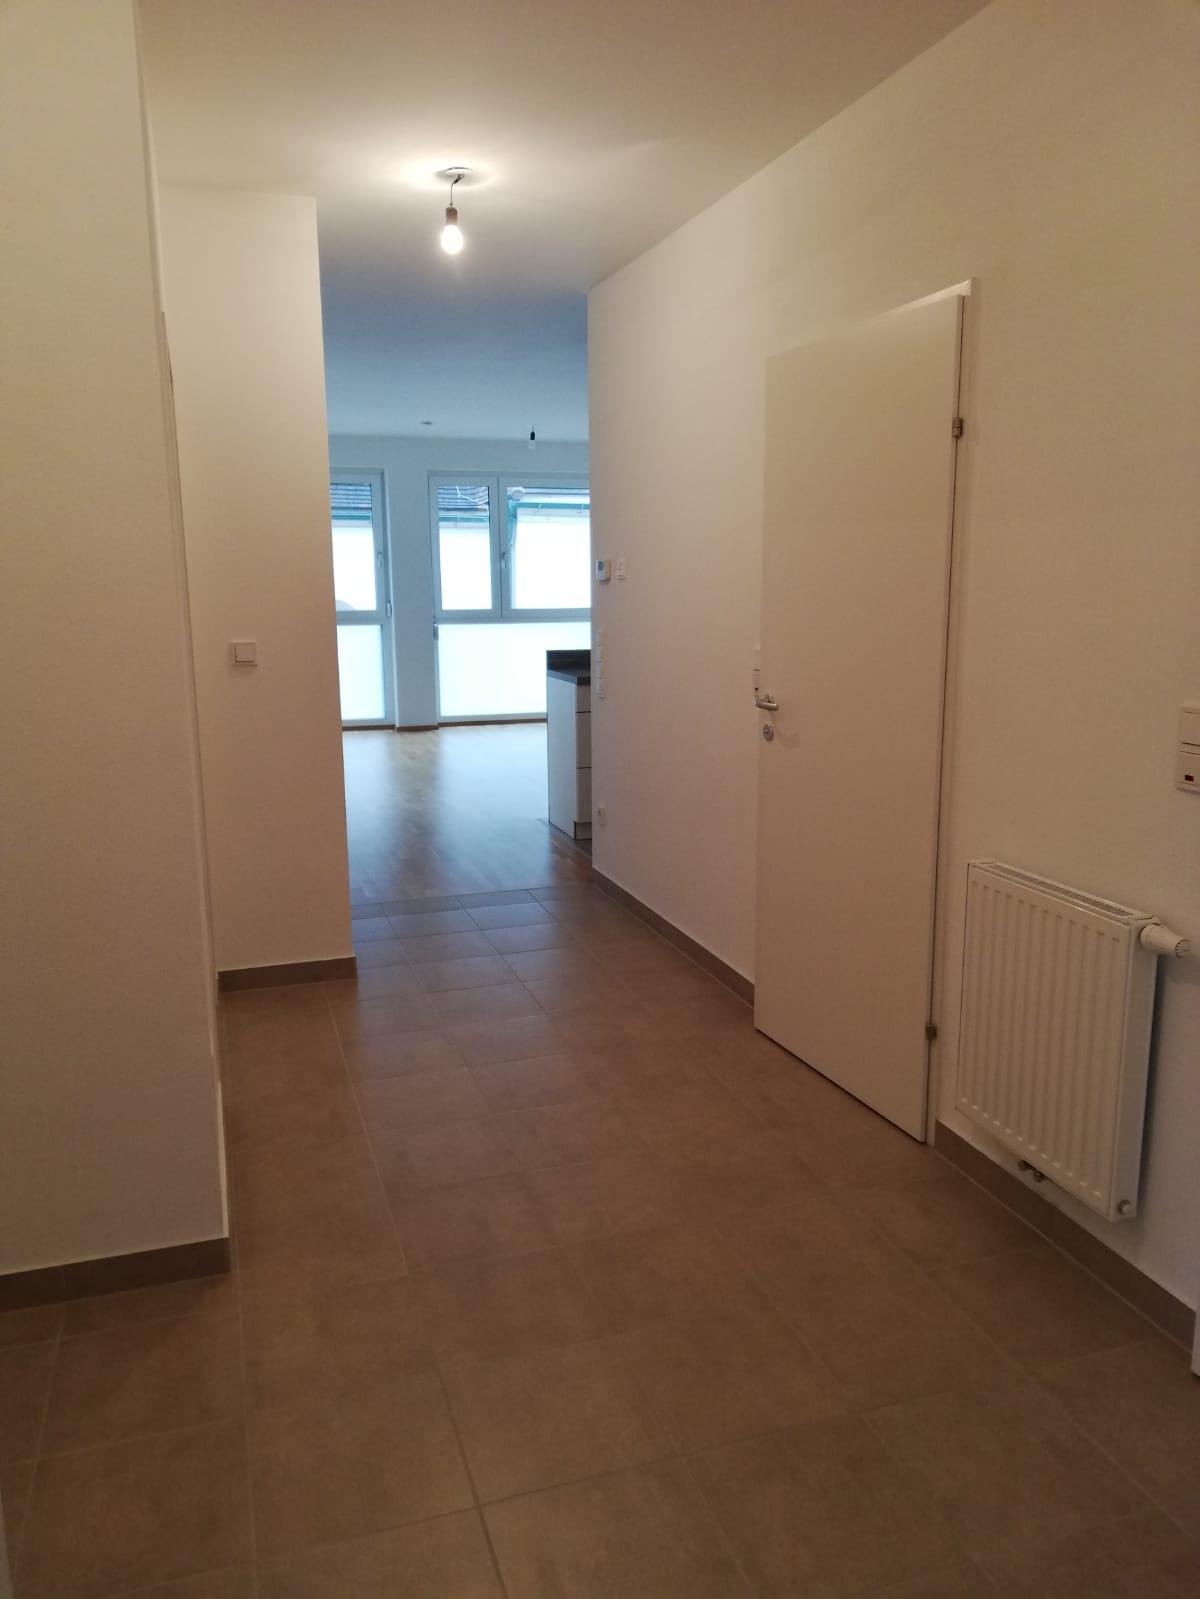 Immobilie von Kamptal in 2143 Großkrut, Mistelbach, Großkrut I - Top 105 #0